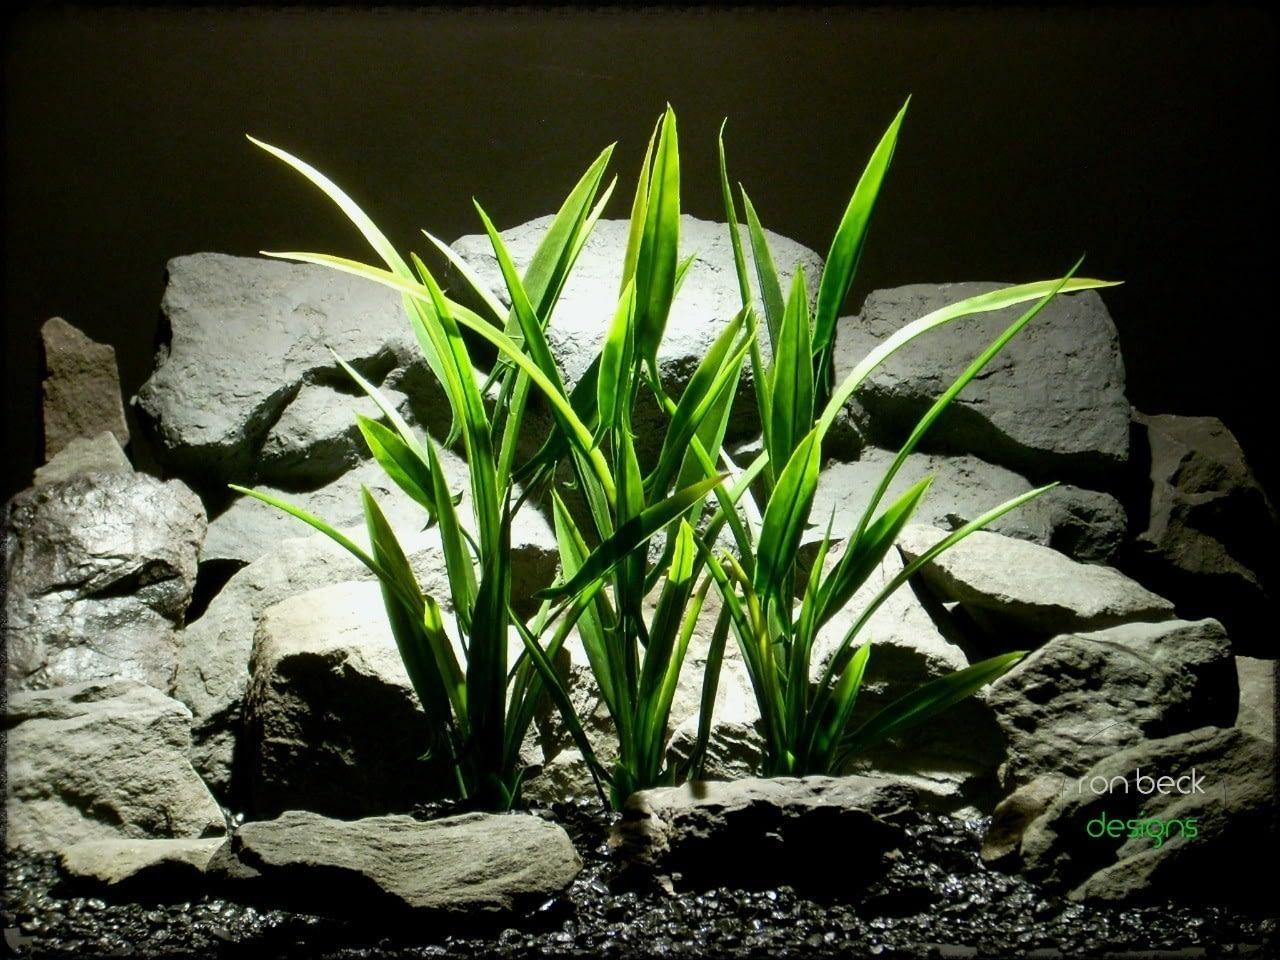 artificial aquarium plants: arrowhead grass plot from ron beck designs, 04 2018